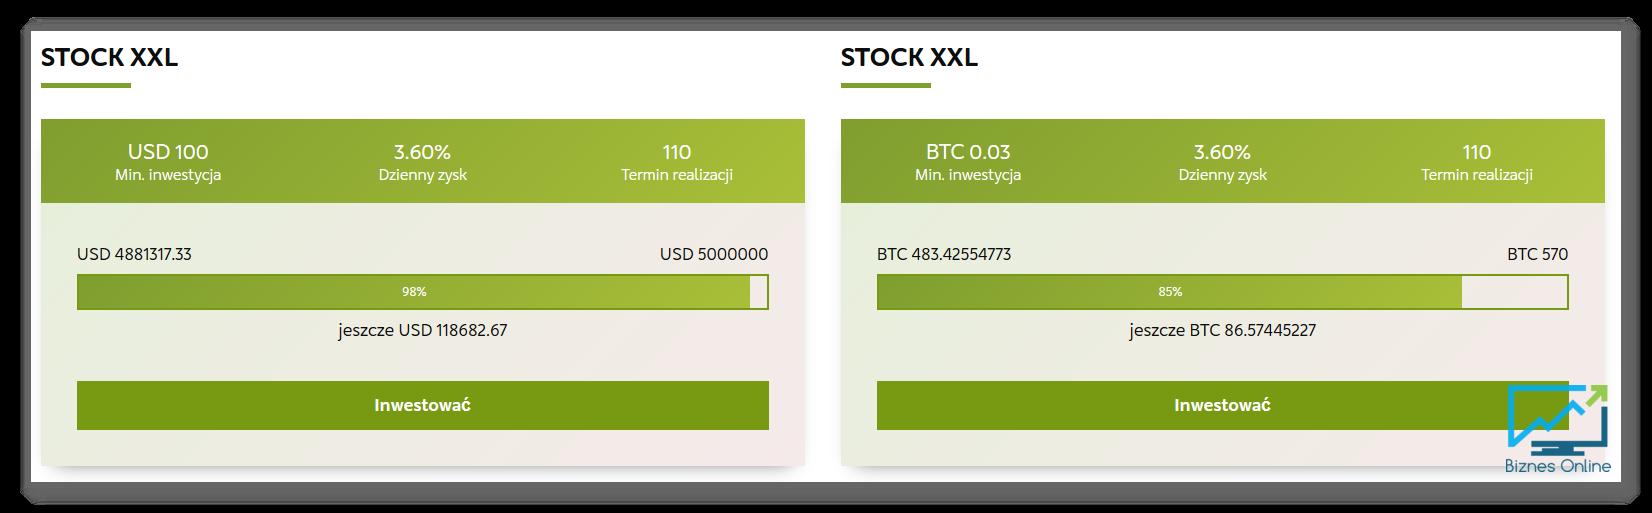 stock xxl